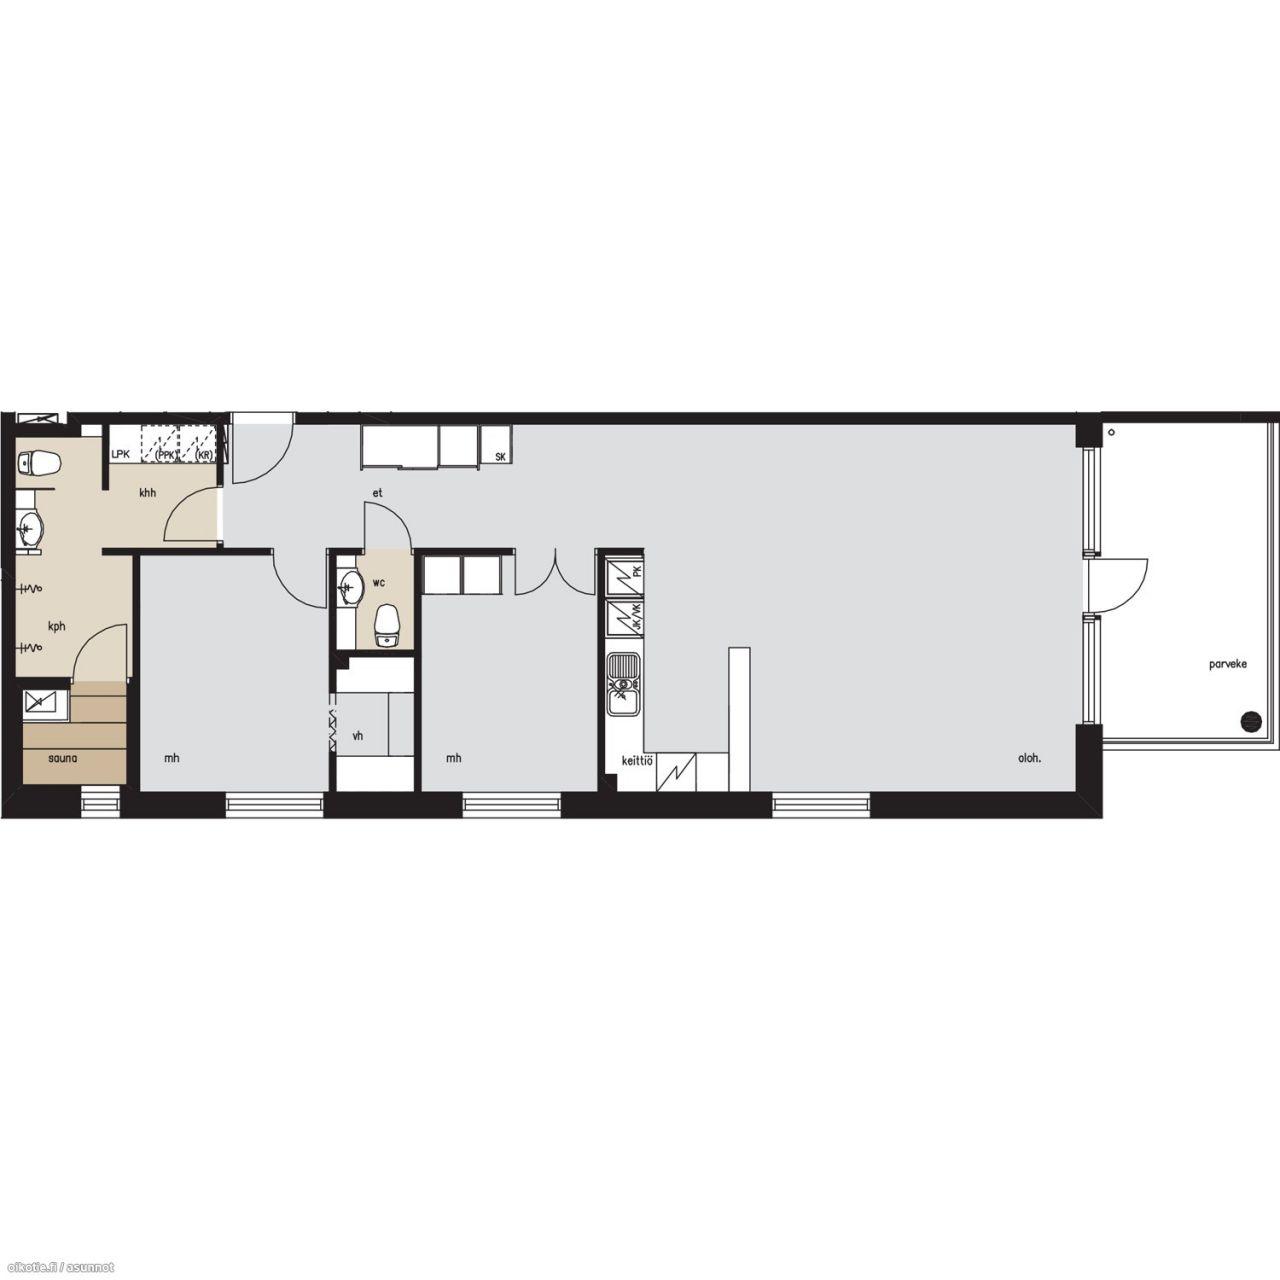 Апартаменты в Рауха, Финляндия, 90.5 м2 - фото 9